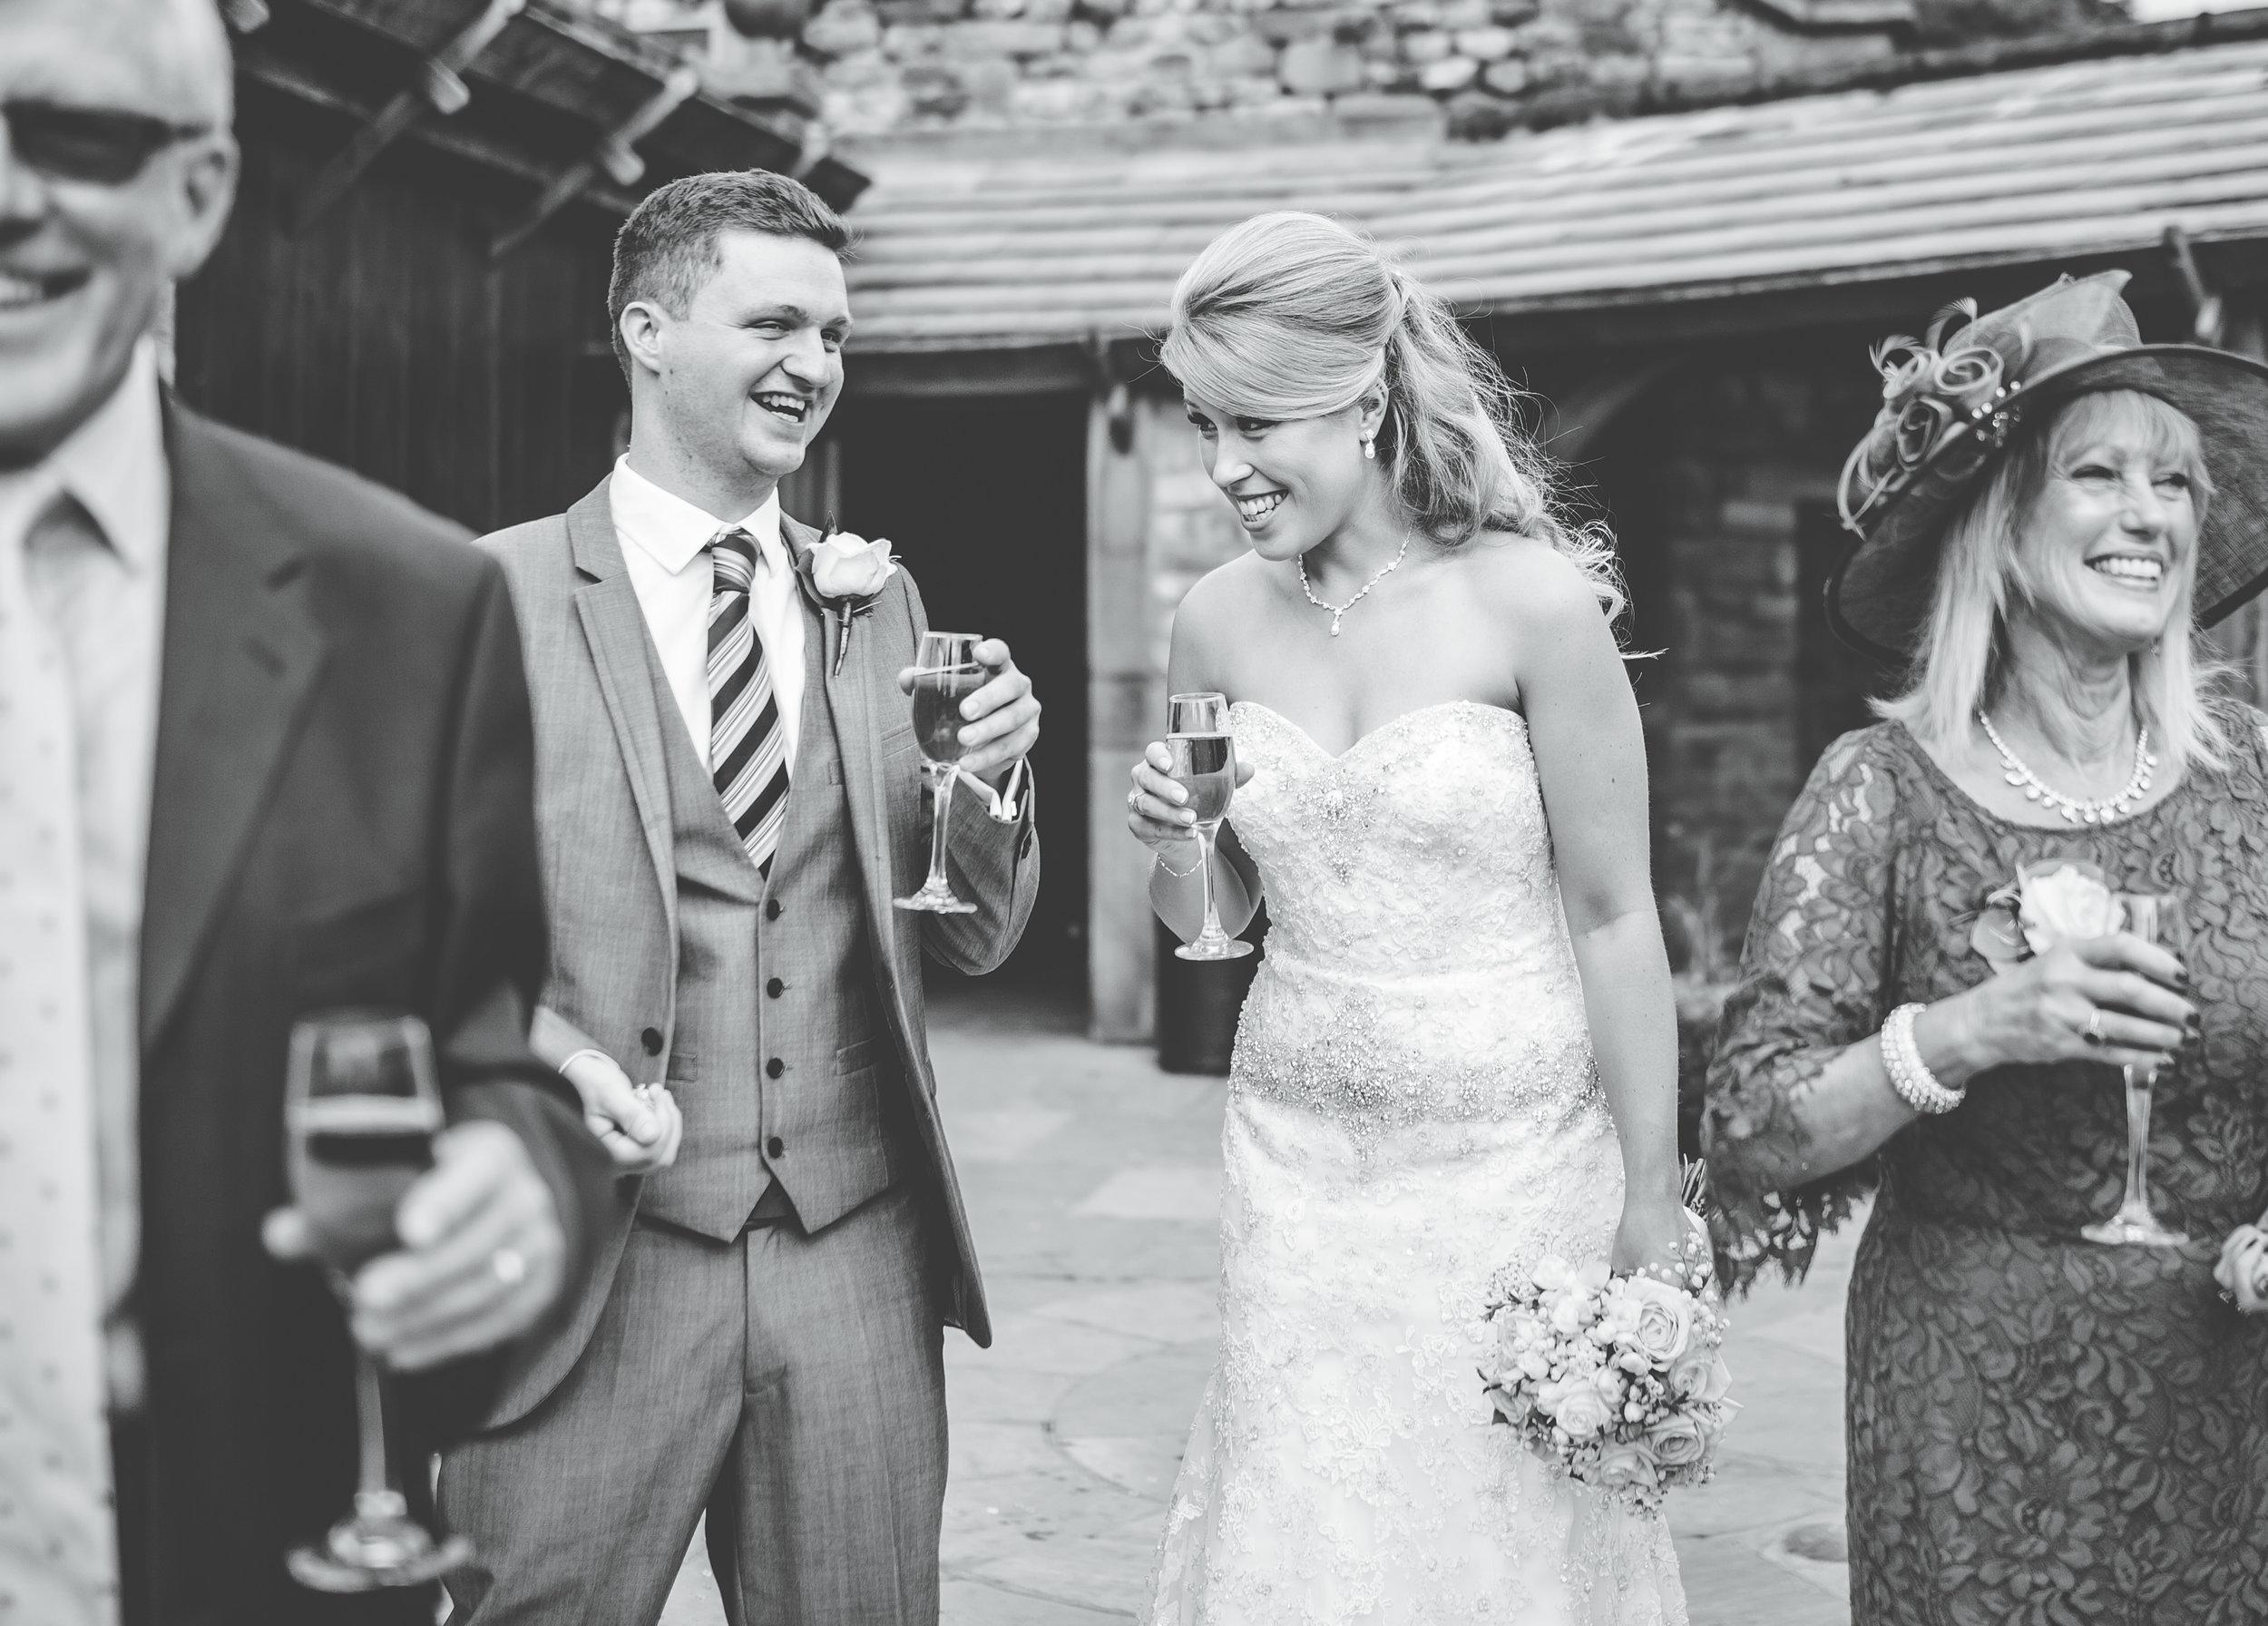 natural wedding photography at Browsholme Hall